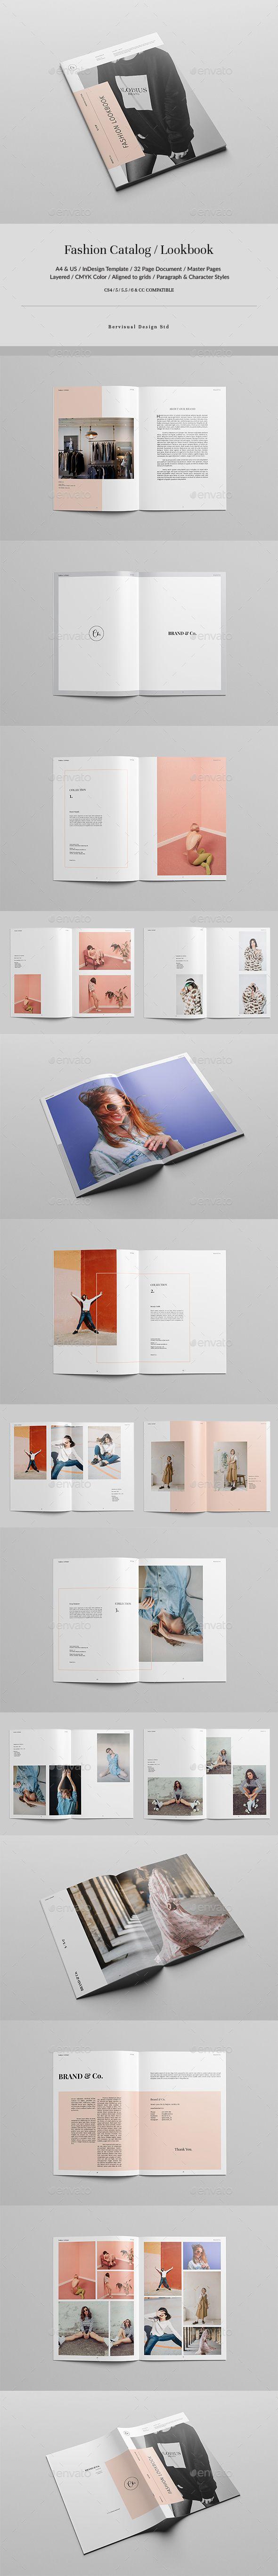 Fashion Catalog / Lookbook - Catalogs #Brochures Download here: https://graphicriver.net/item/fashion-catalogue-lookbook/19316199?ref=alena994